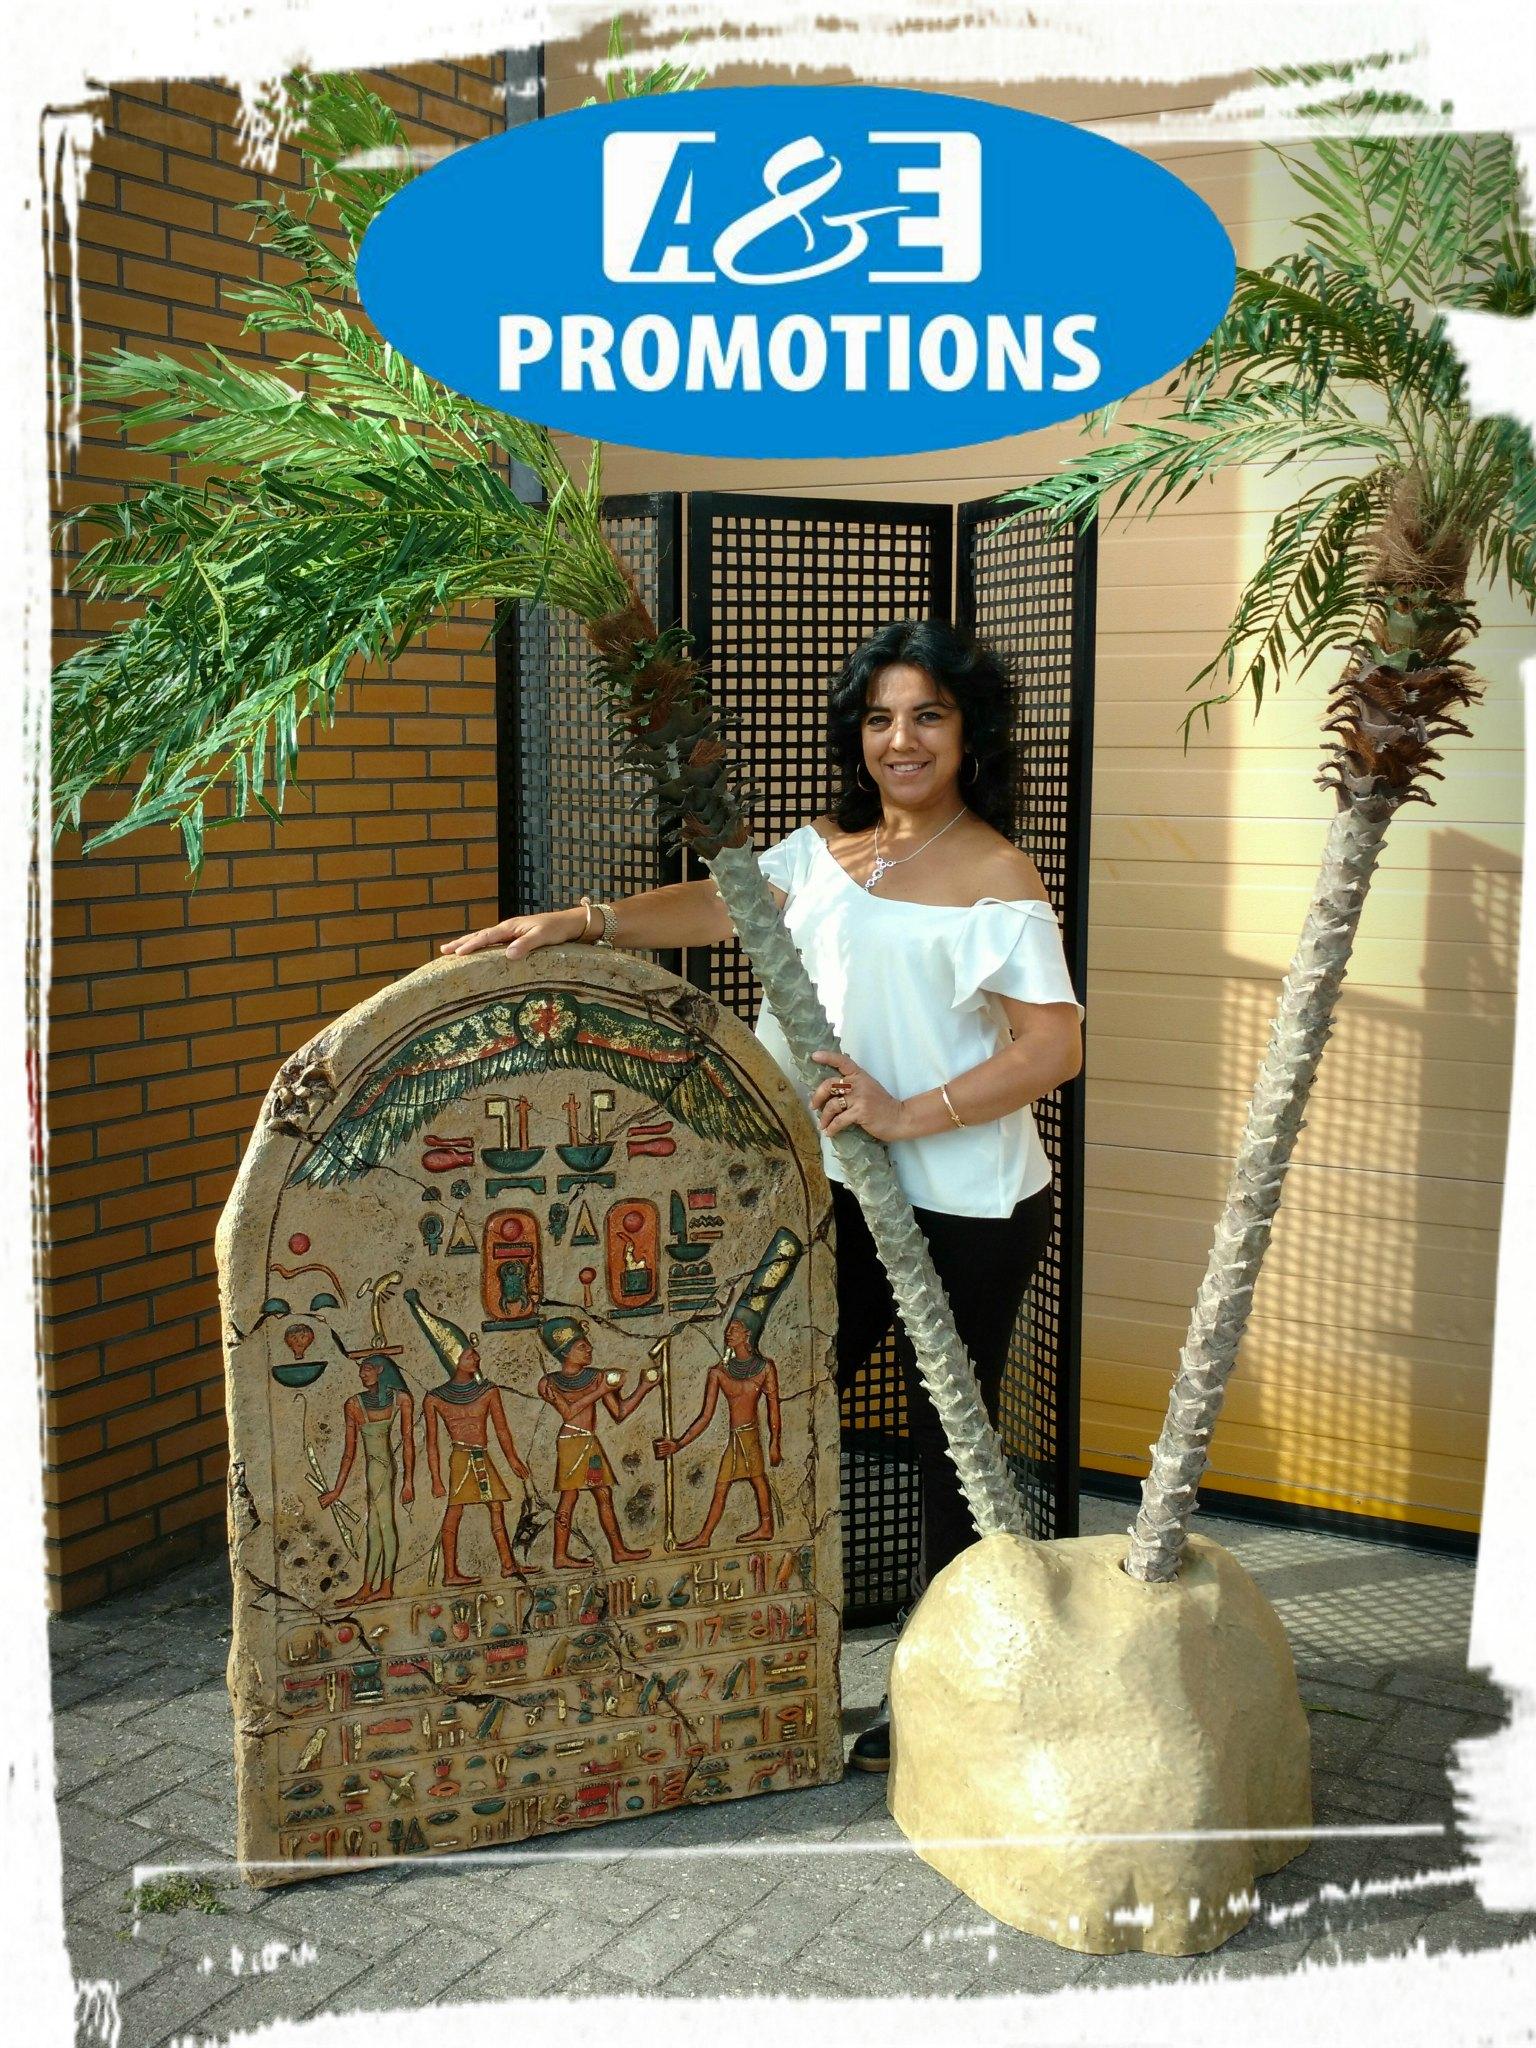 3D PLAQUETTE EGYPTE EUR 55,00 & PALMSETS IN DIVERSE UITVOERINGEN V.A. EUR 45,00